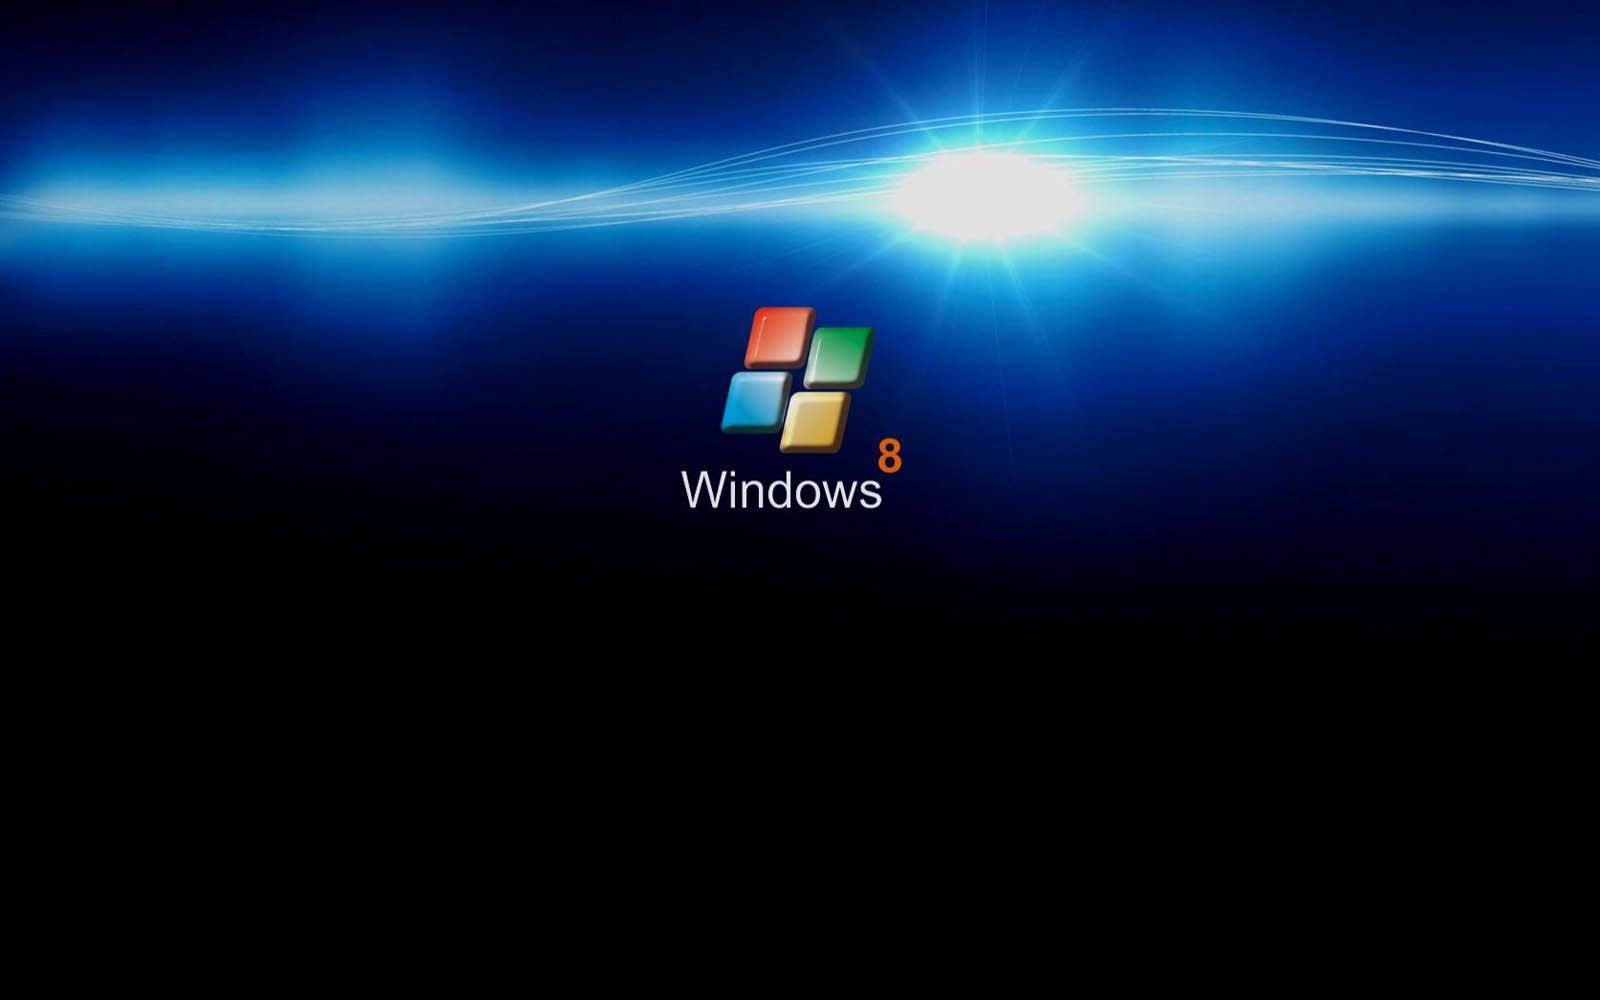 wallpapers windows 8 desktop backgrounds windows 8 photos windows 8 1600x1000